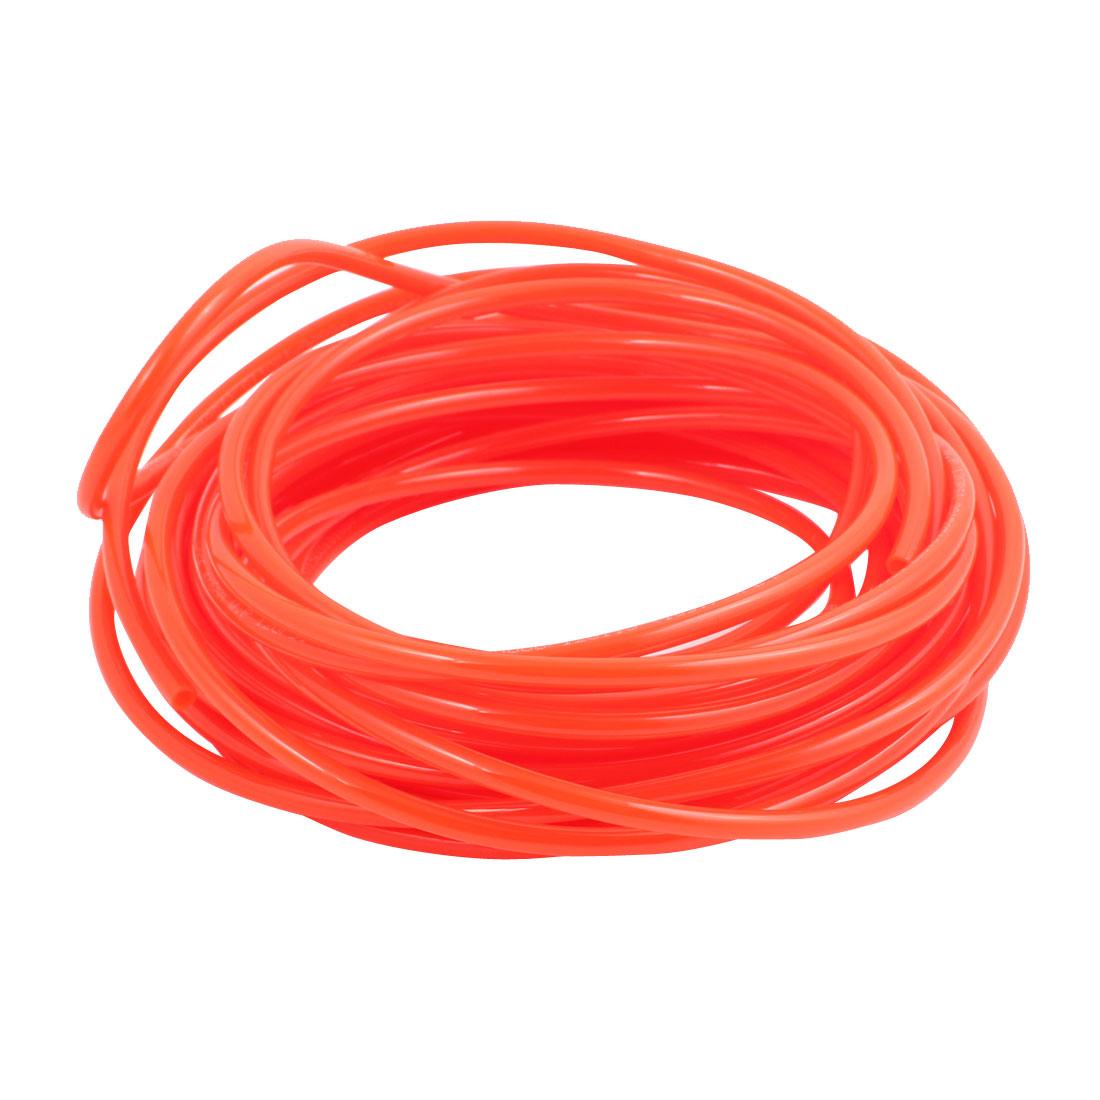 4mm x 6mm Pneumatic Air Compressor Tubing PU Hose Tube Pipe 14 meter Orange